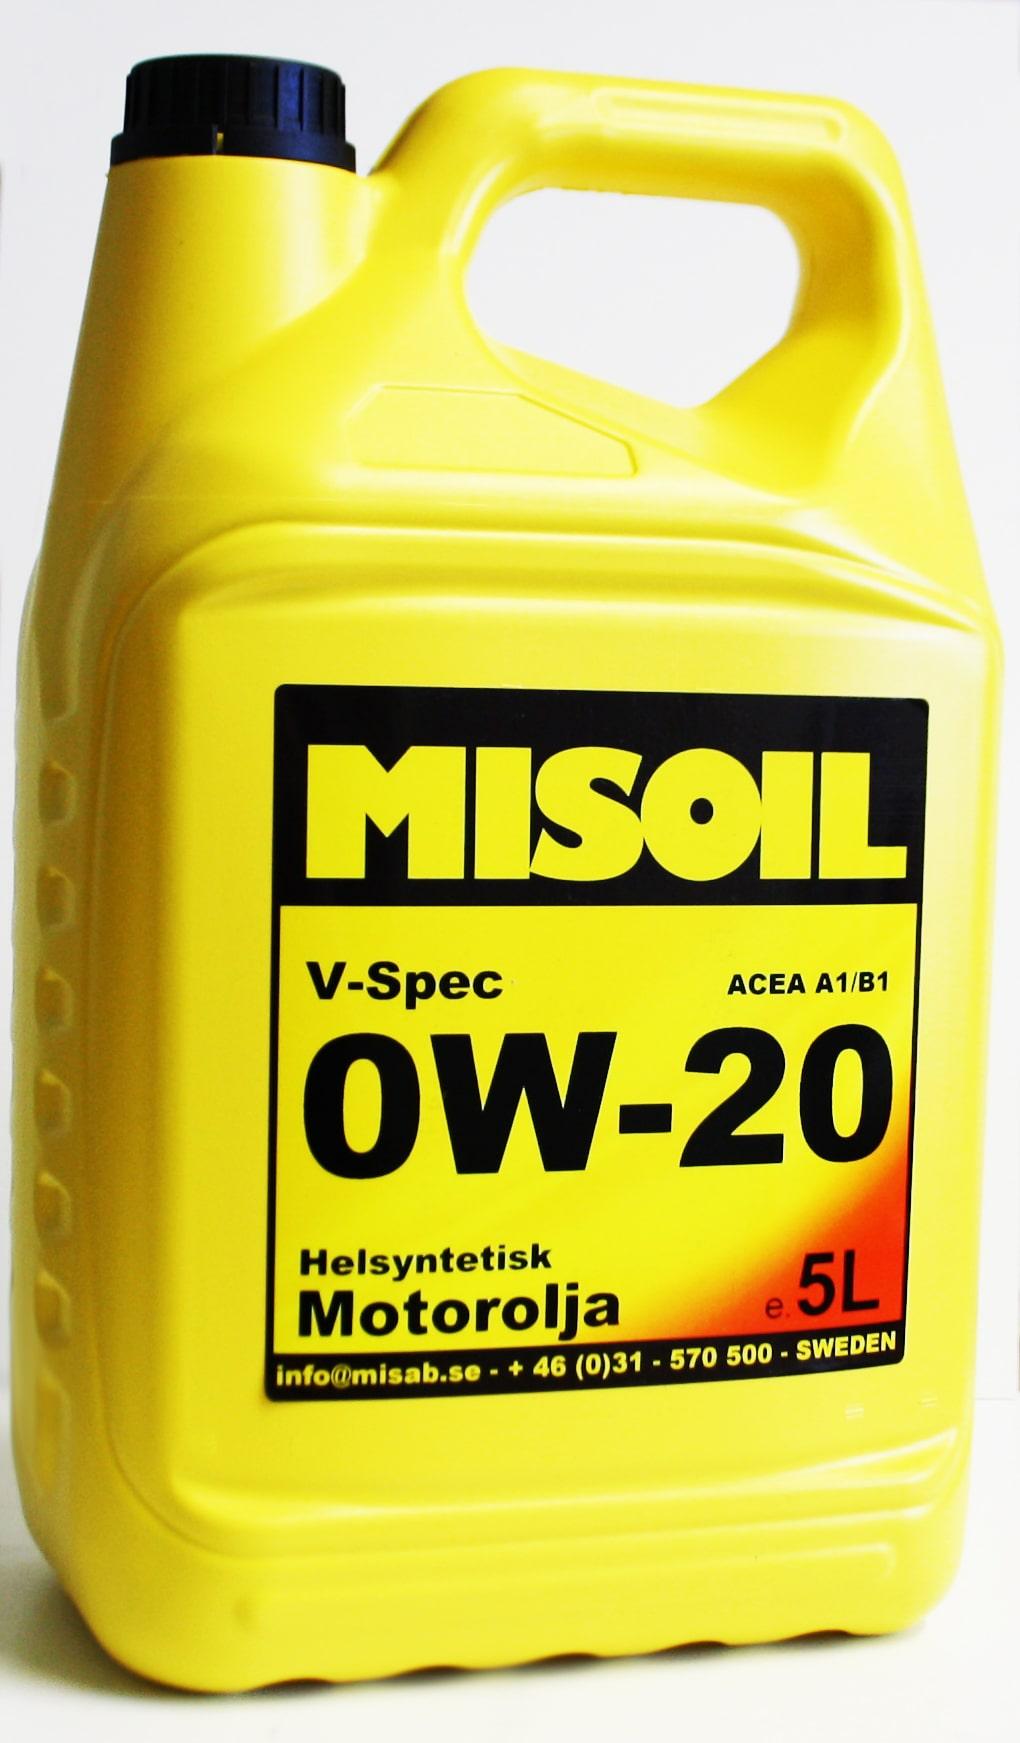 MISOIL 0W-20 V-SPEC 1L